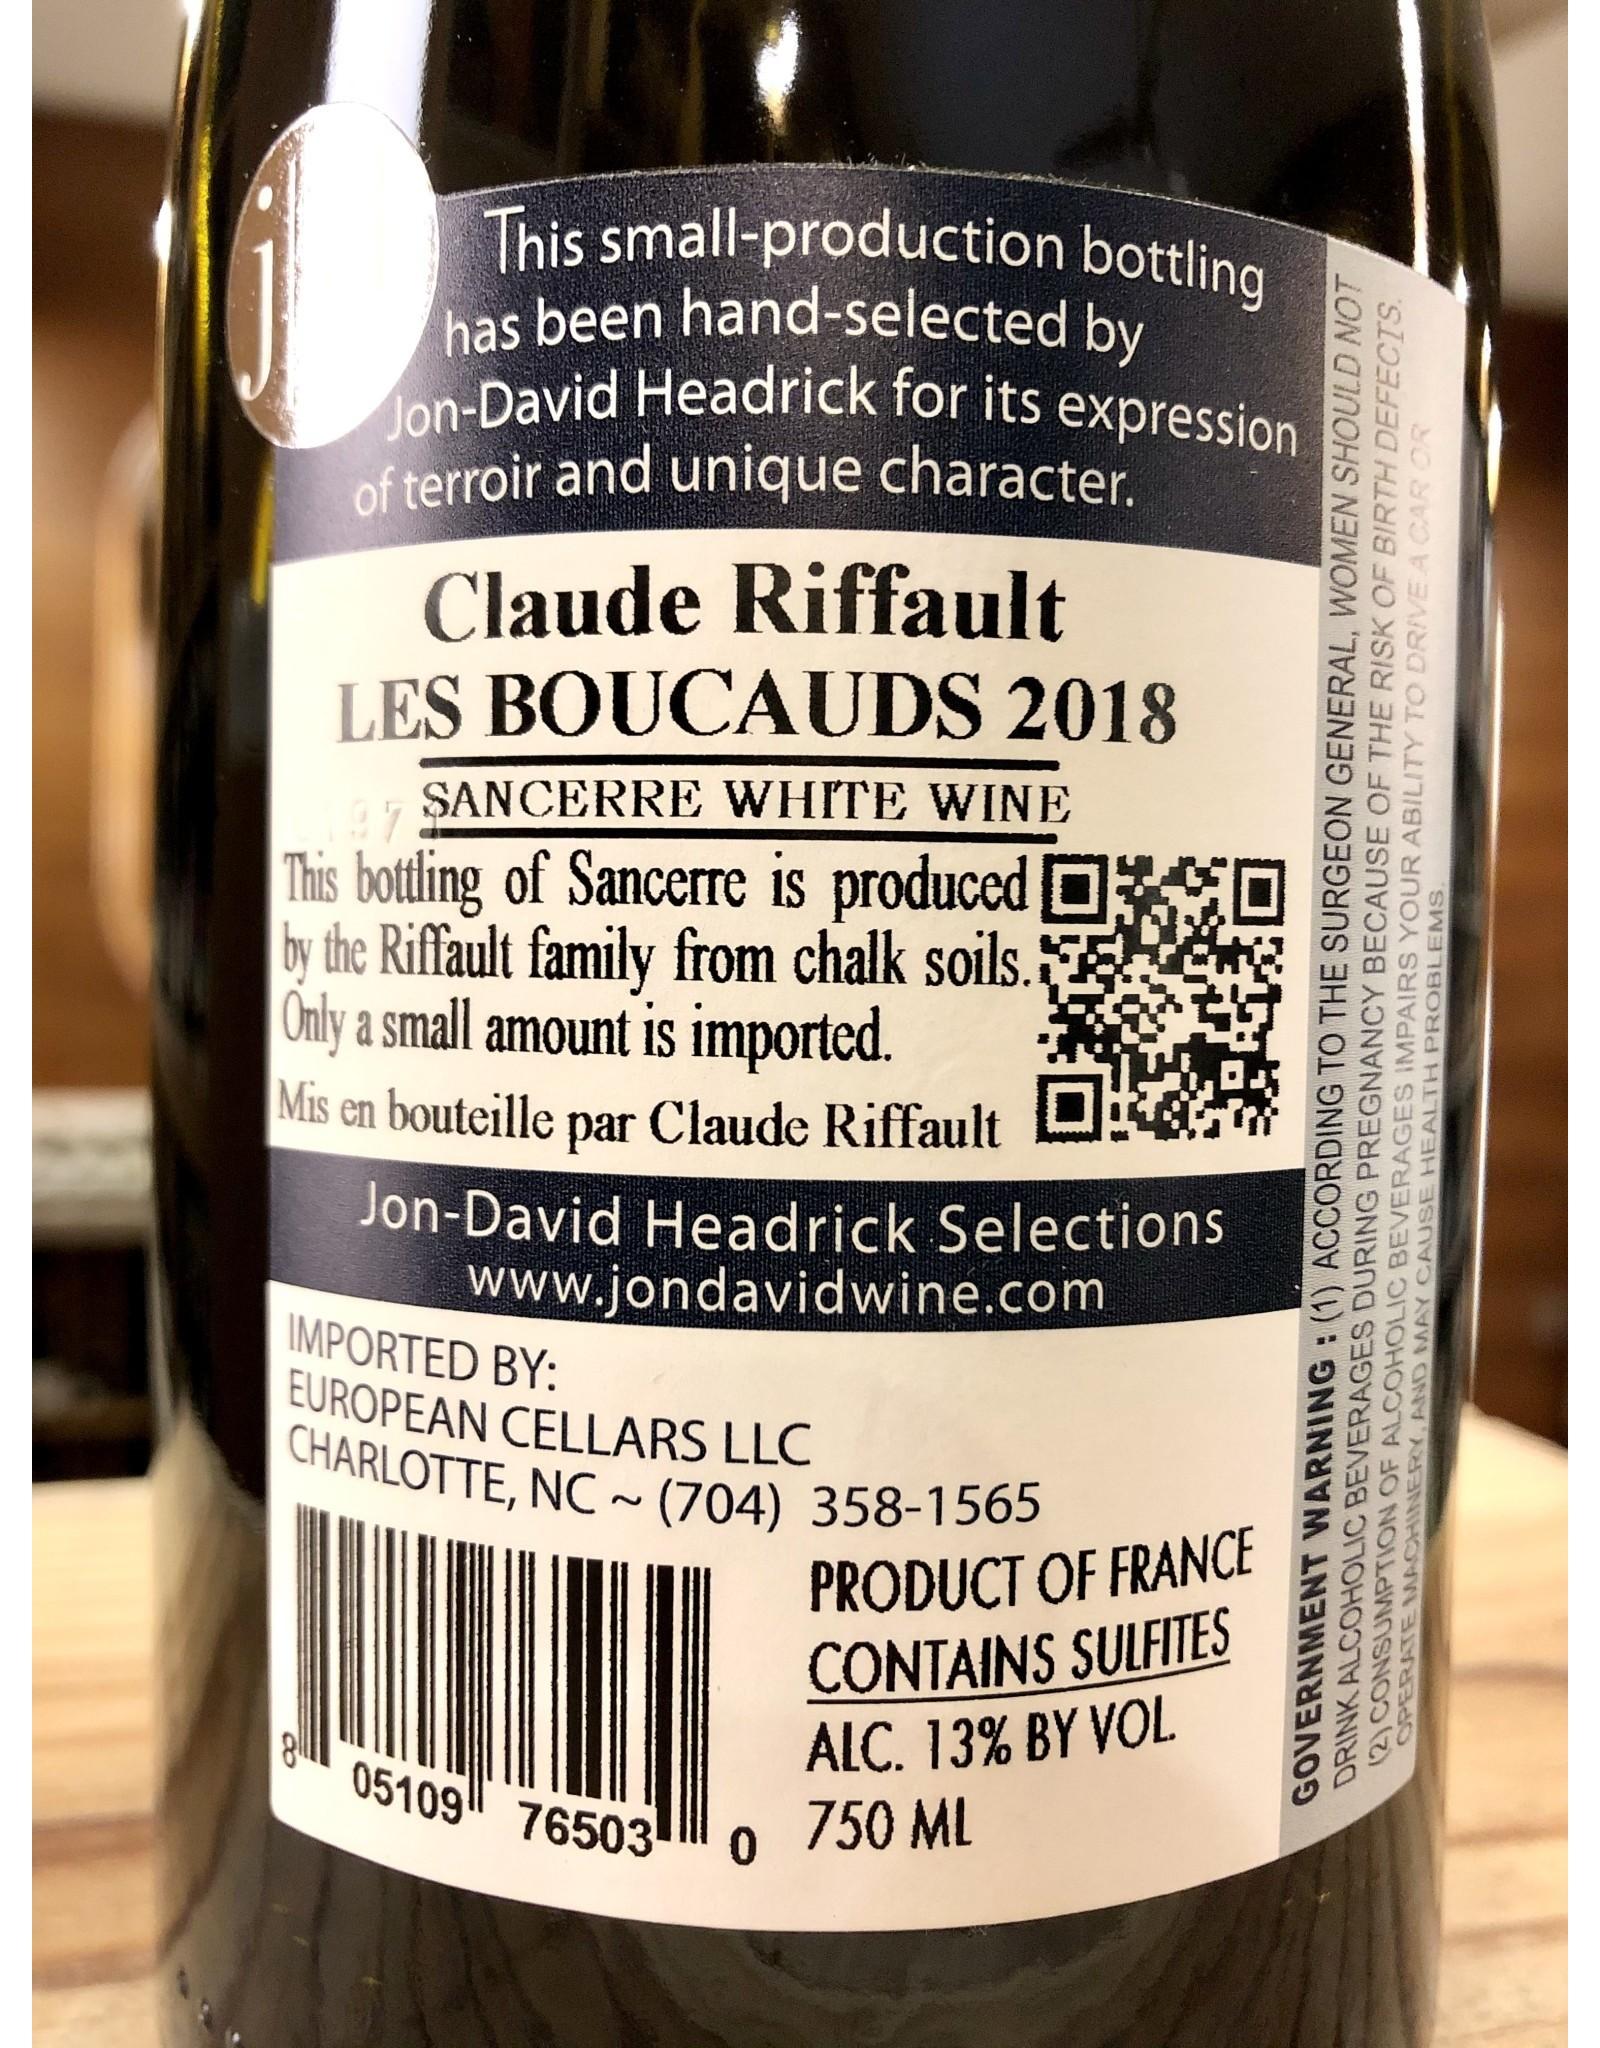 Claude Riffault Les Boucauds Sancerre - 750 ML